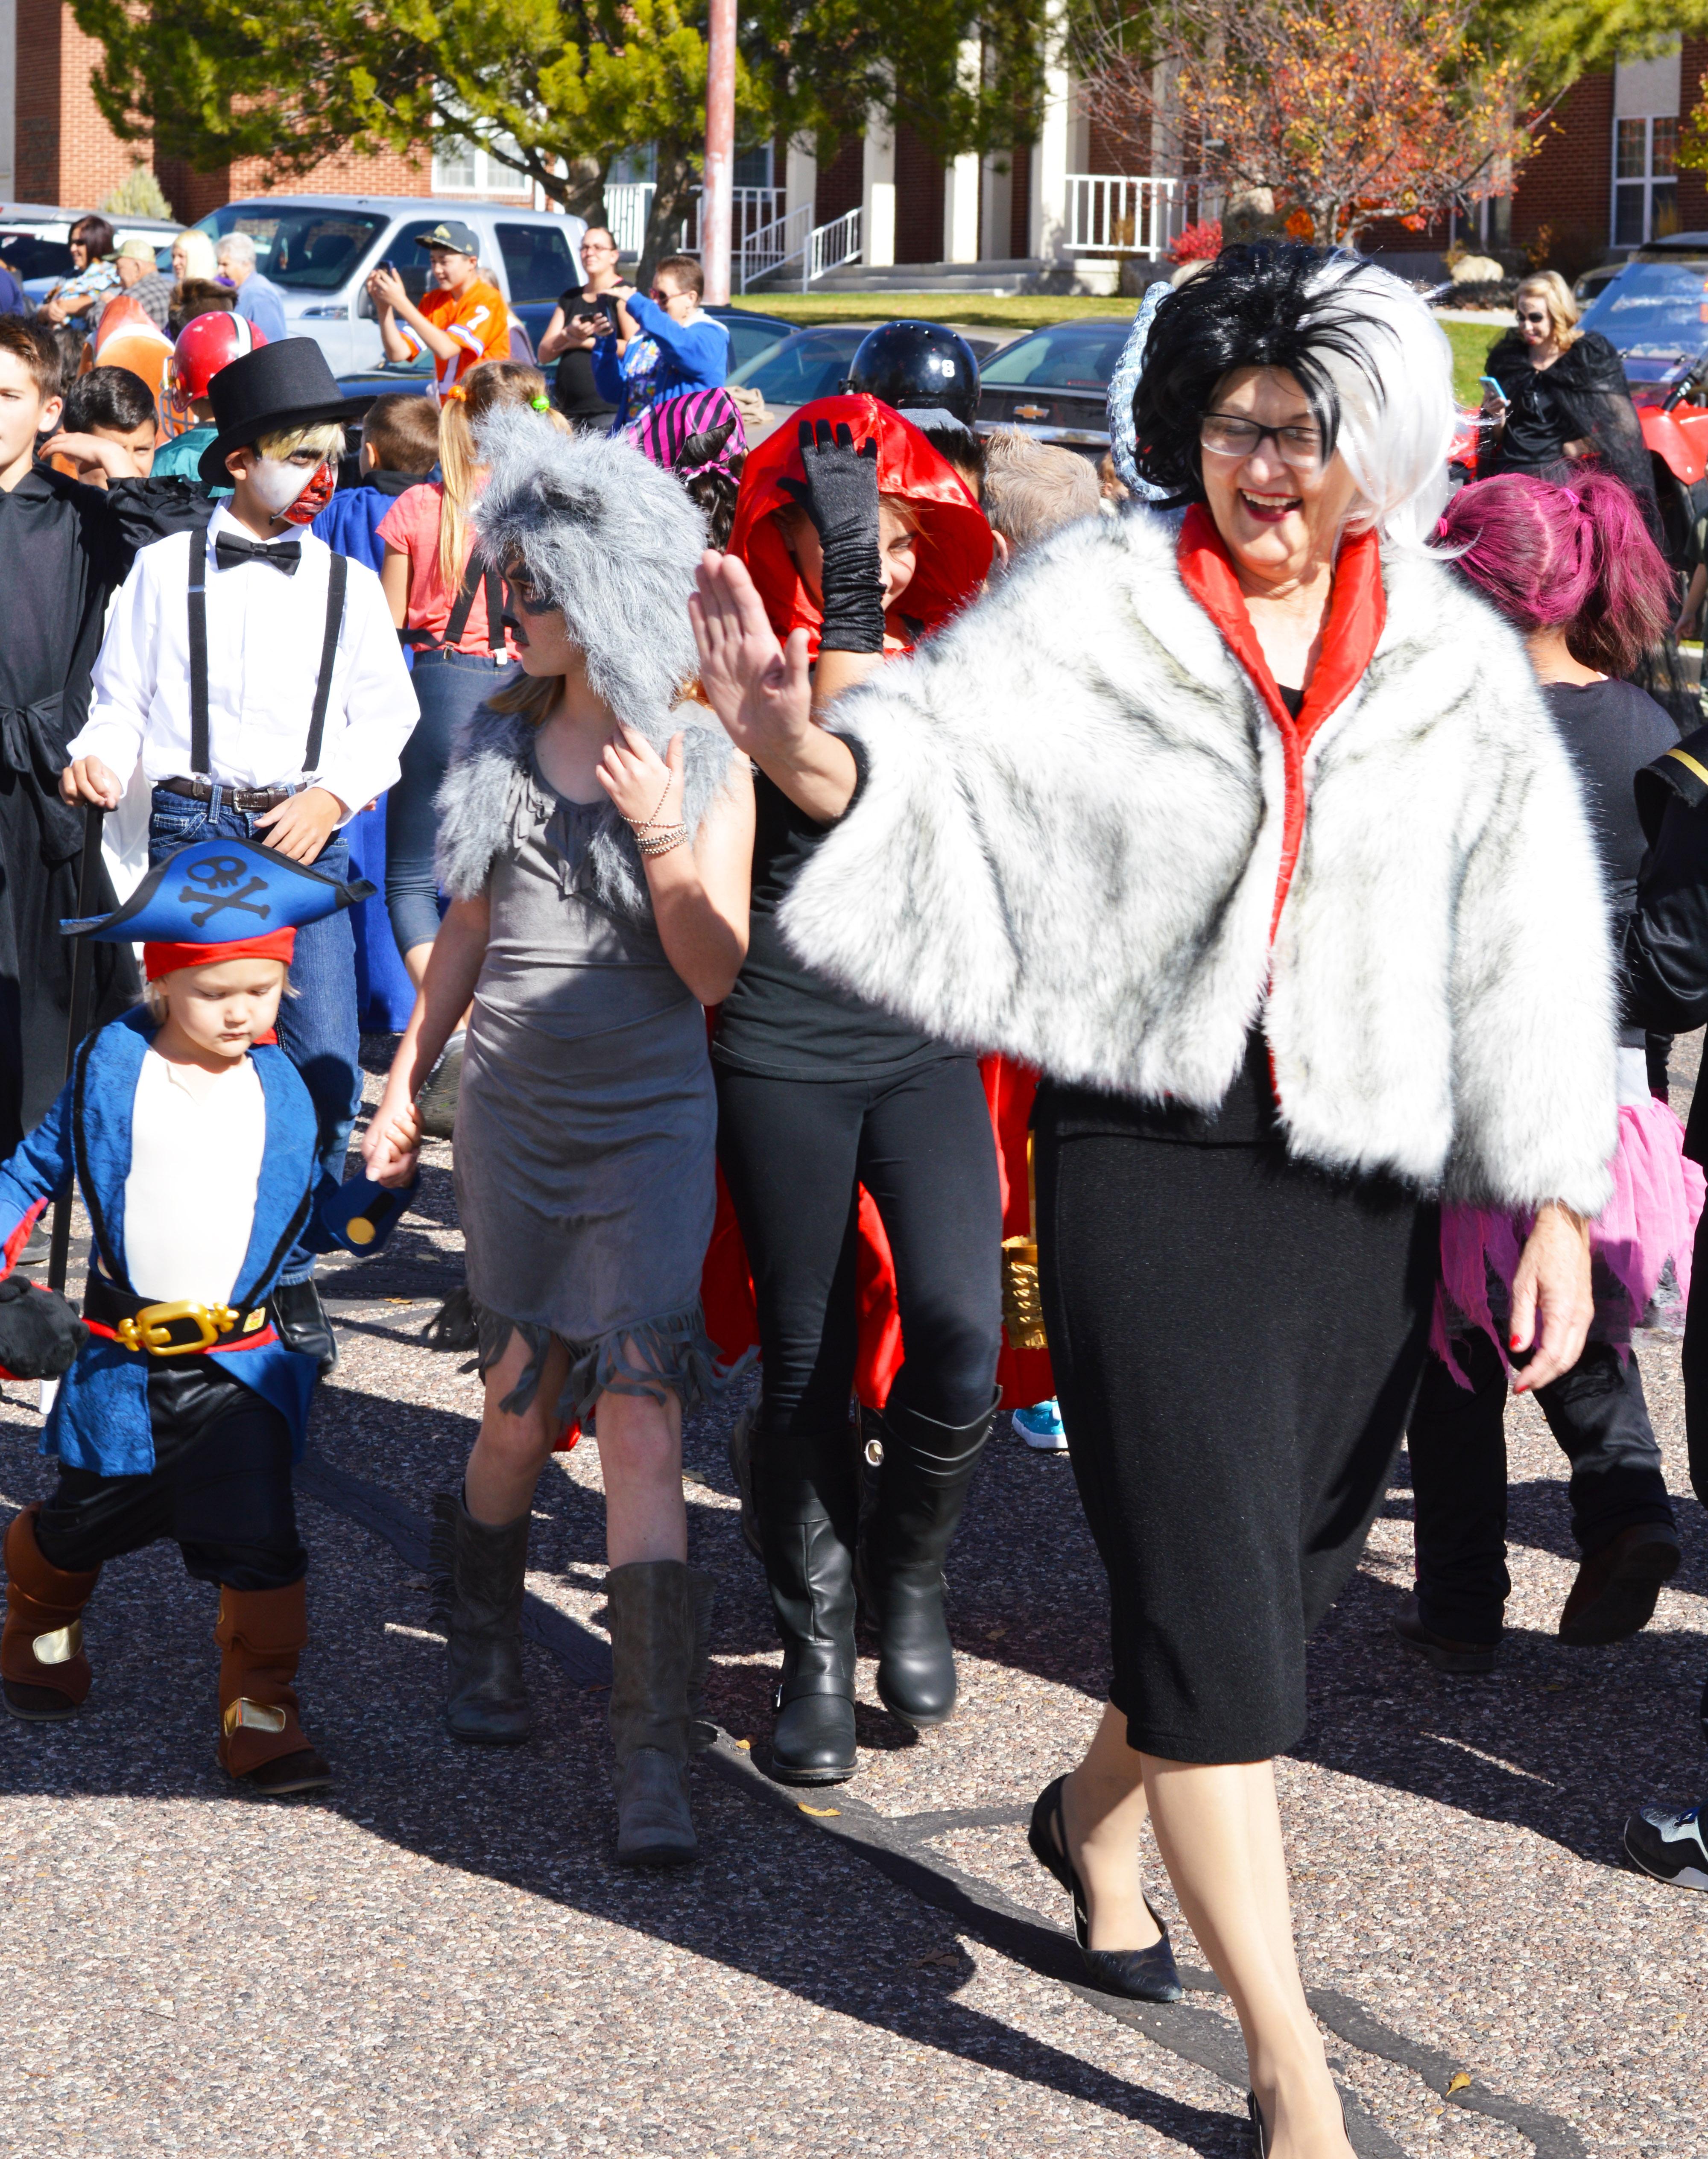 Mrs. Mary Curl leads her fifth grade class in their parade clad as Cruella de Vil. - Daniela Vazquez / Messenger photo